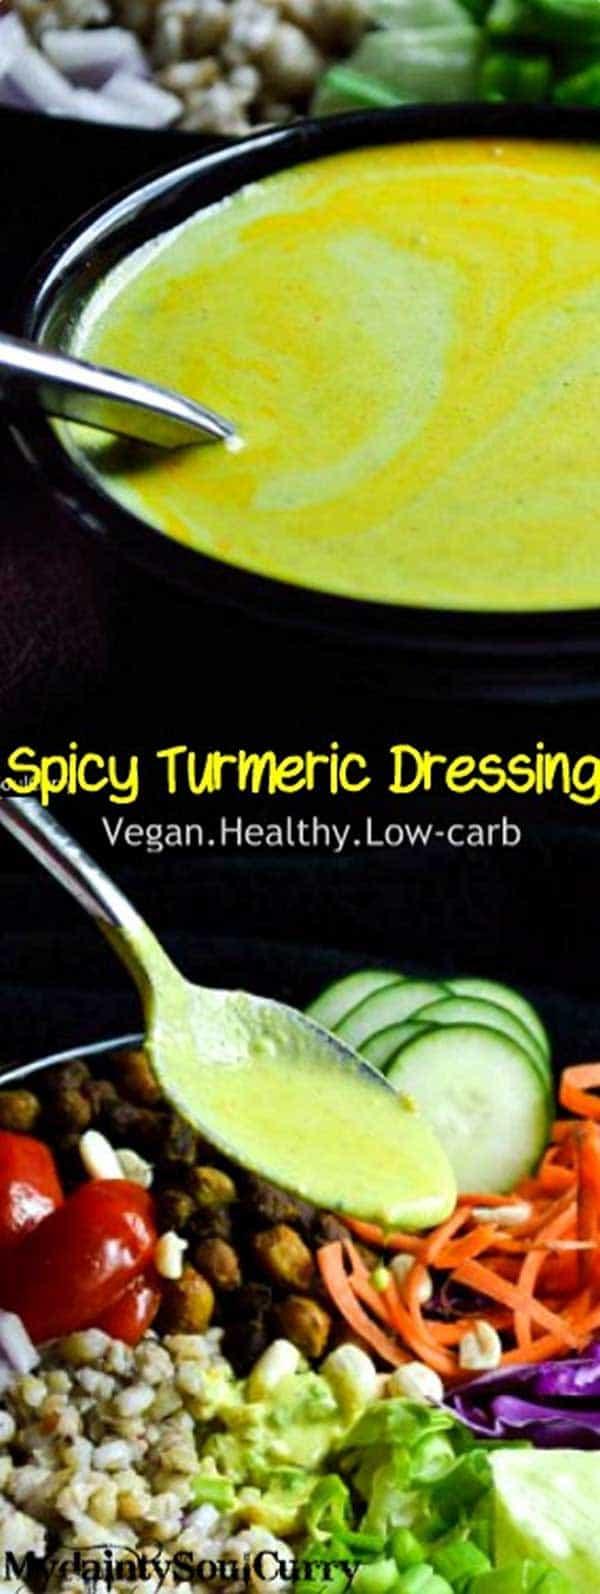 Spicy Turmeric dressing with Vegan Barley Salad #vegan #healthy